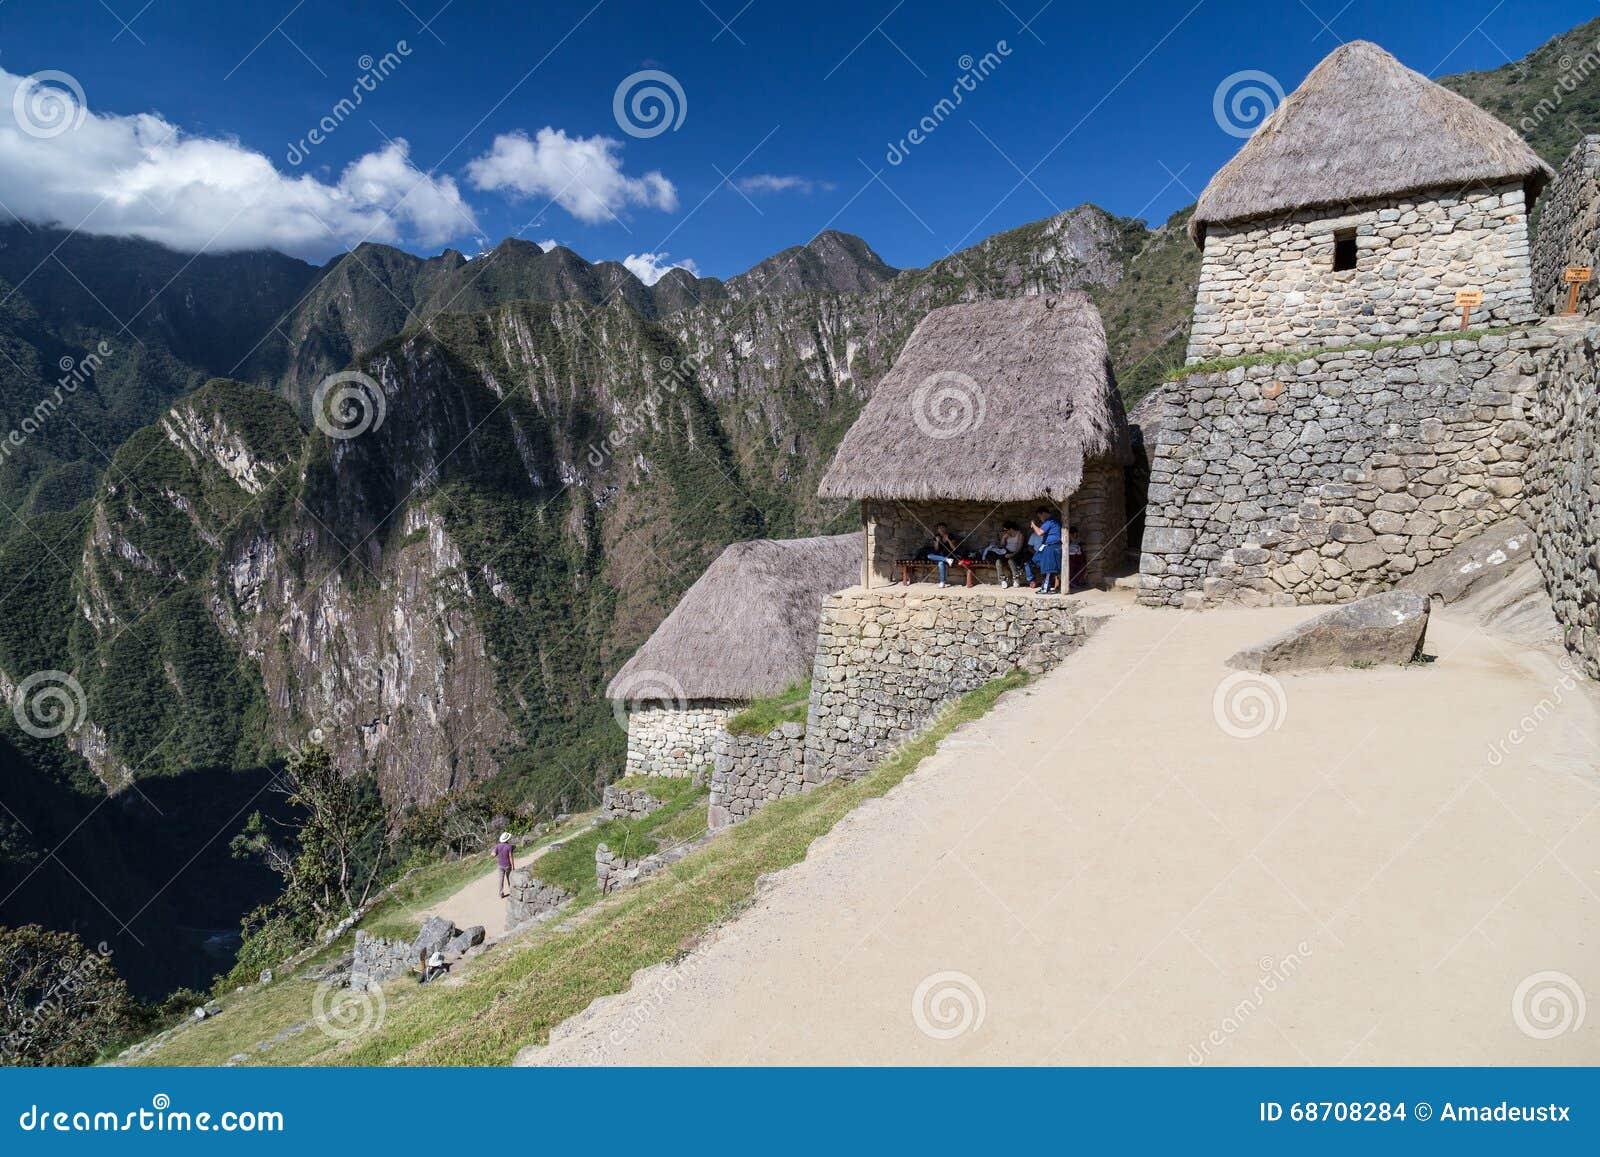 Machu Picchu, Aguas Calientes/Peru - circa Juni 2015: Ruïnes van de heilige verloren stad van Machu Picchu van Incas in Peru